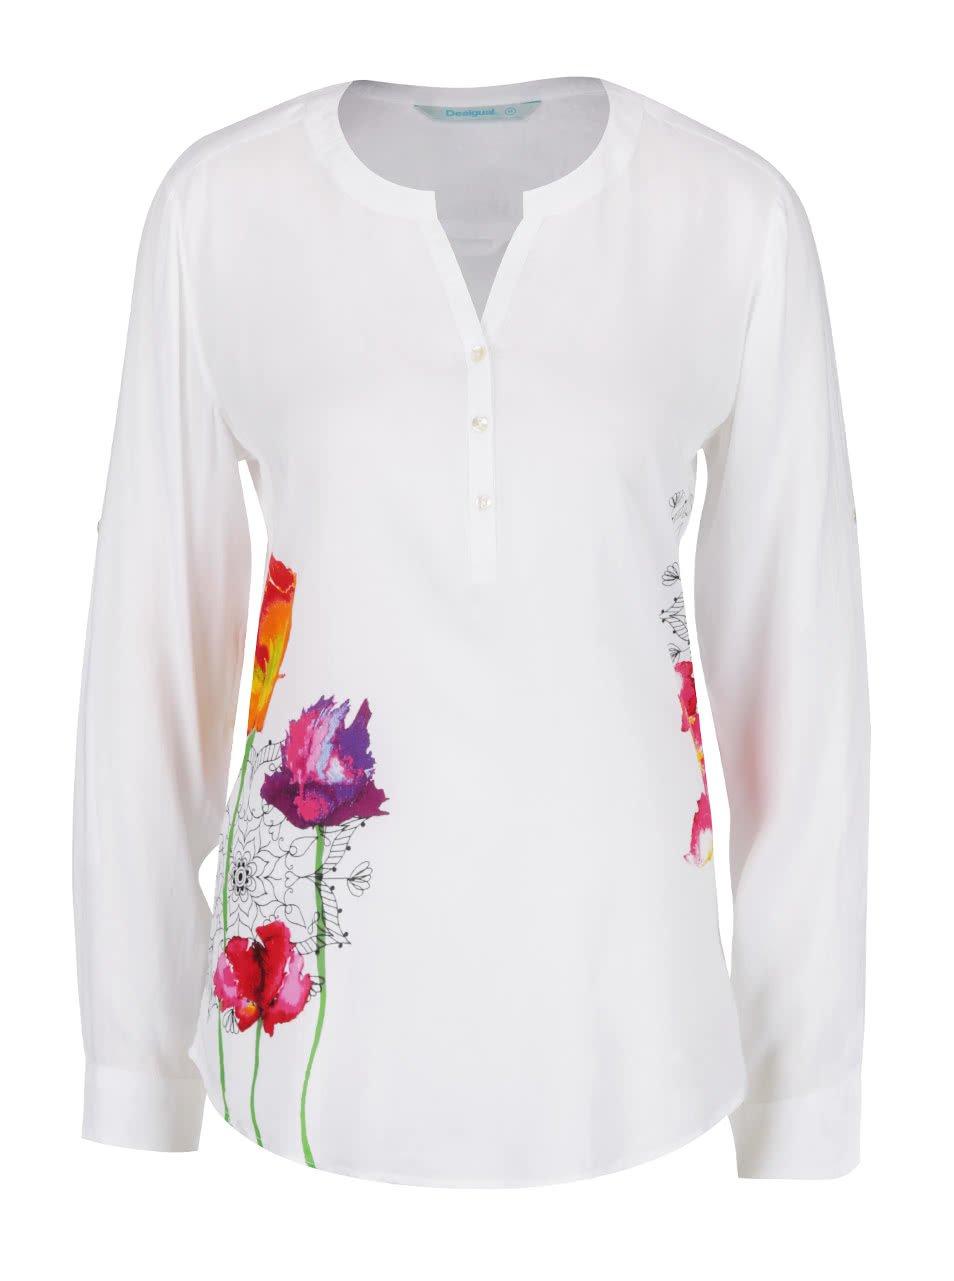 Bílá halenka s potiskem květin Desigual Olga